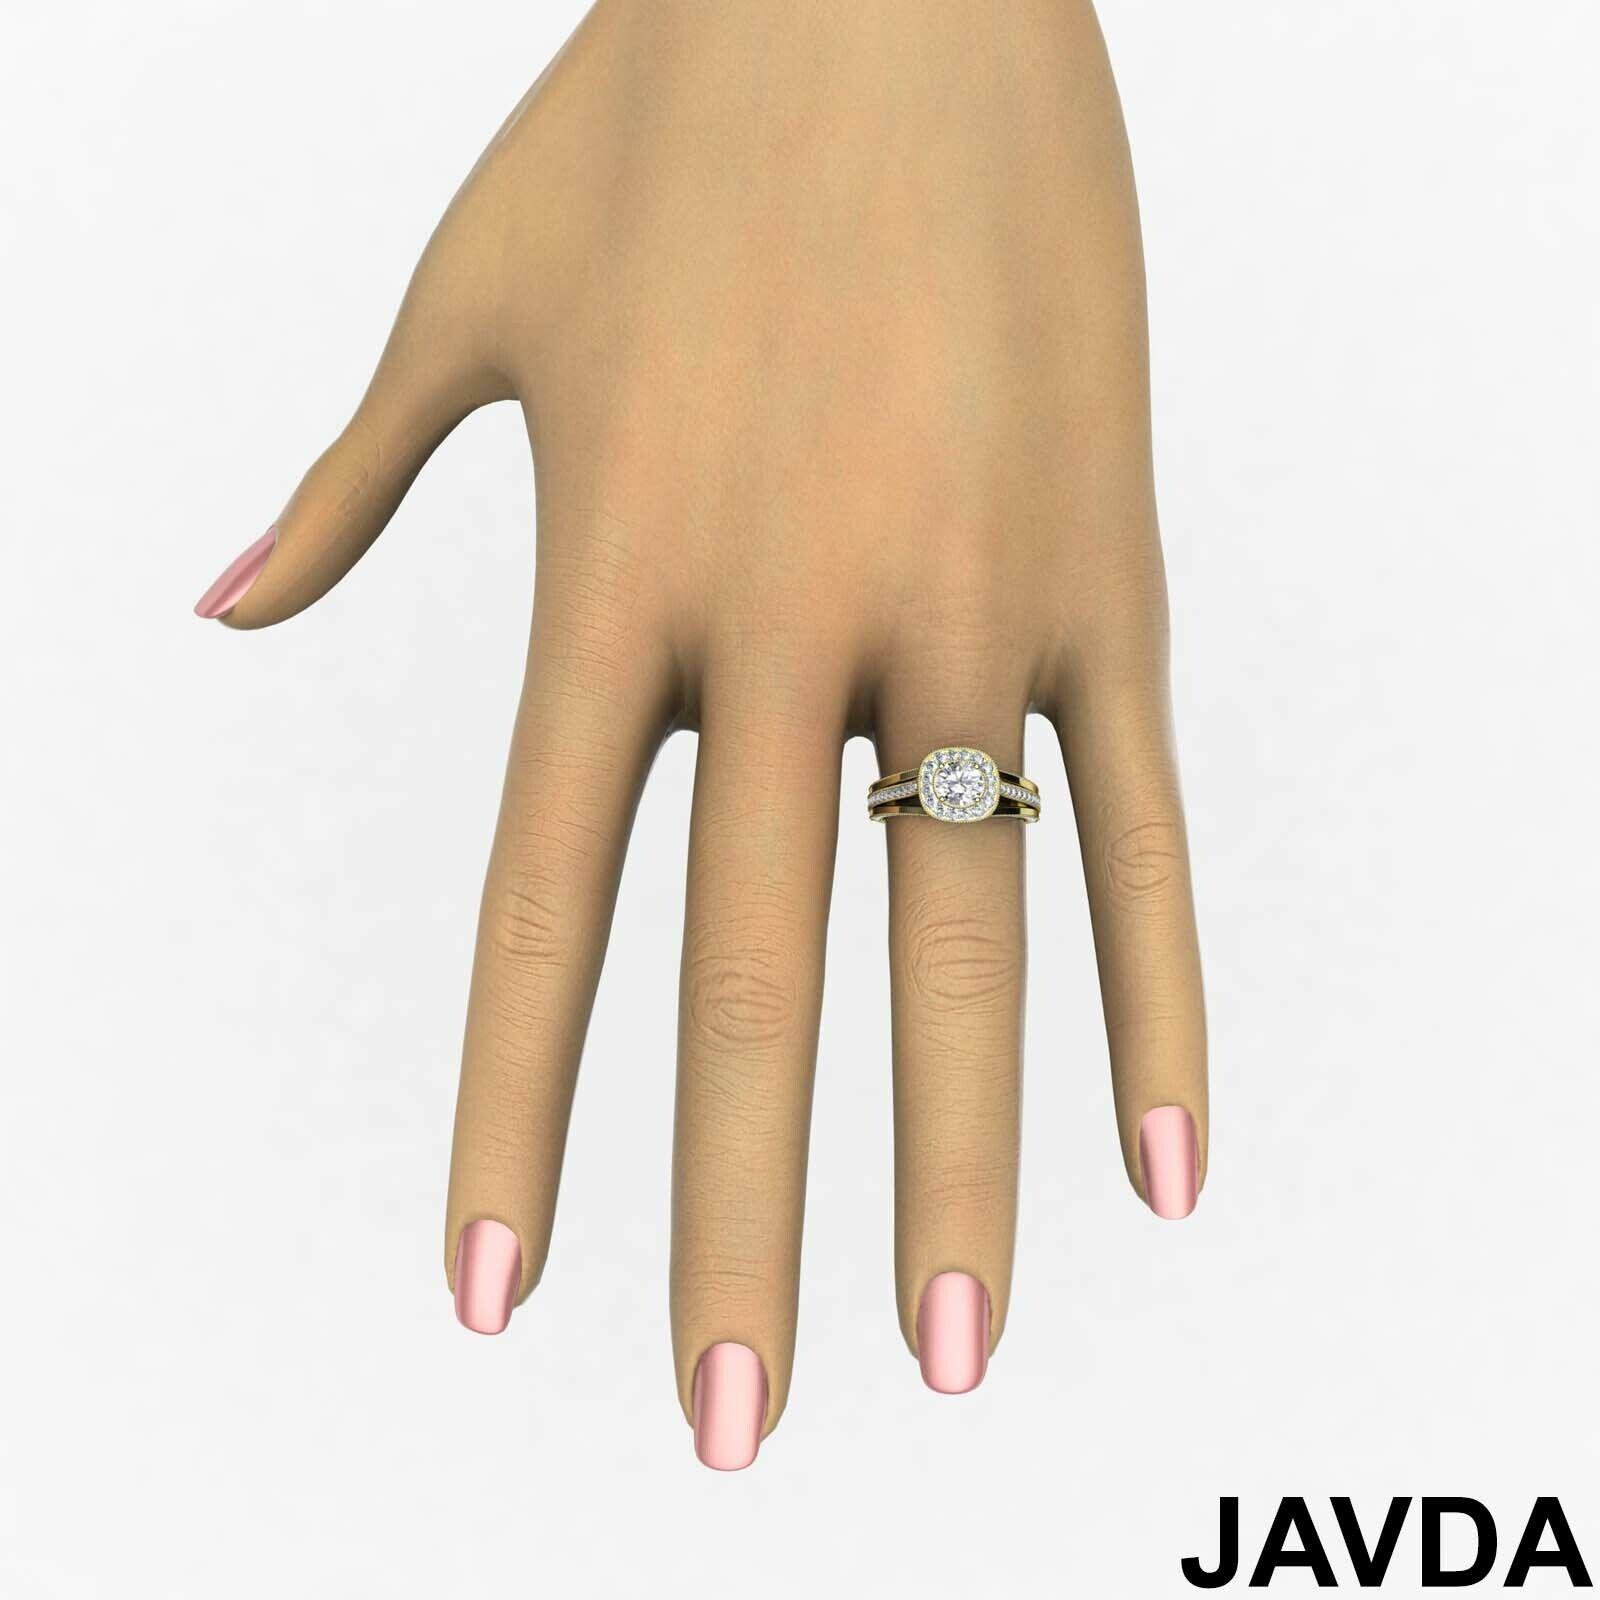 1.6ctw Bridge Accent Round Diamond Engagement Ring GIA E-VVS2 White Gold Rings 8